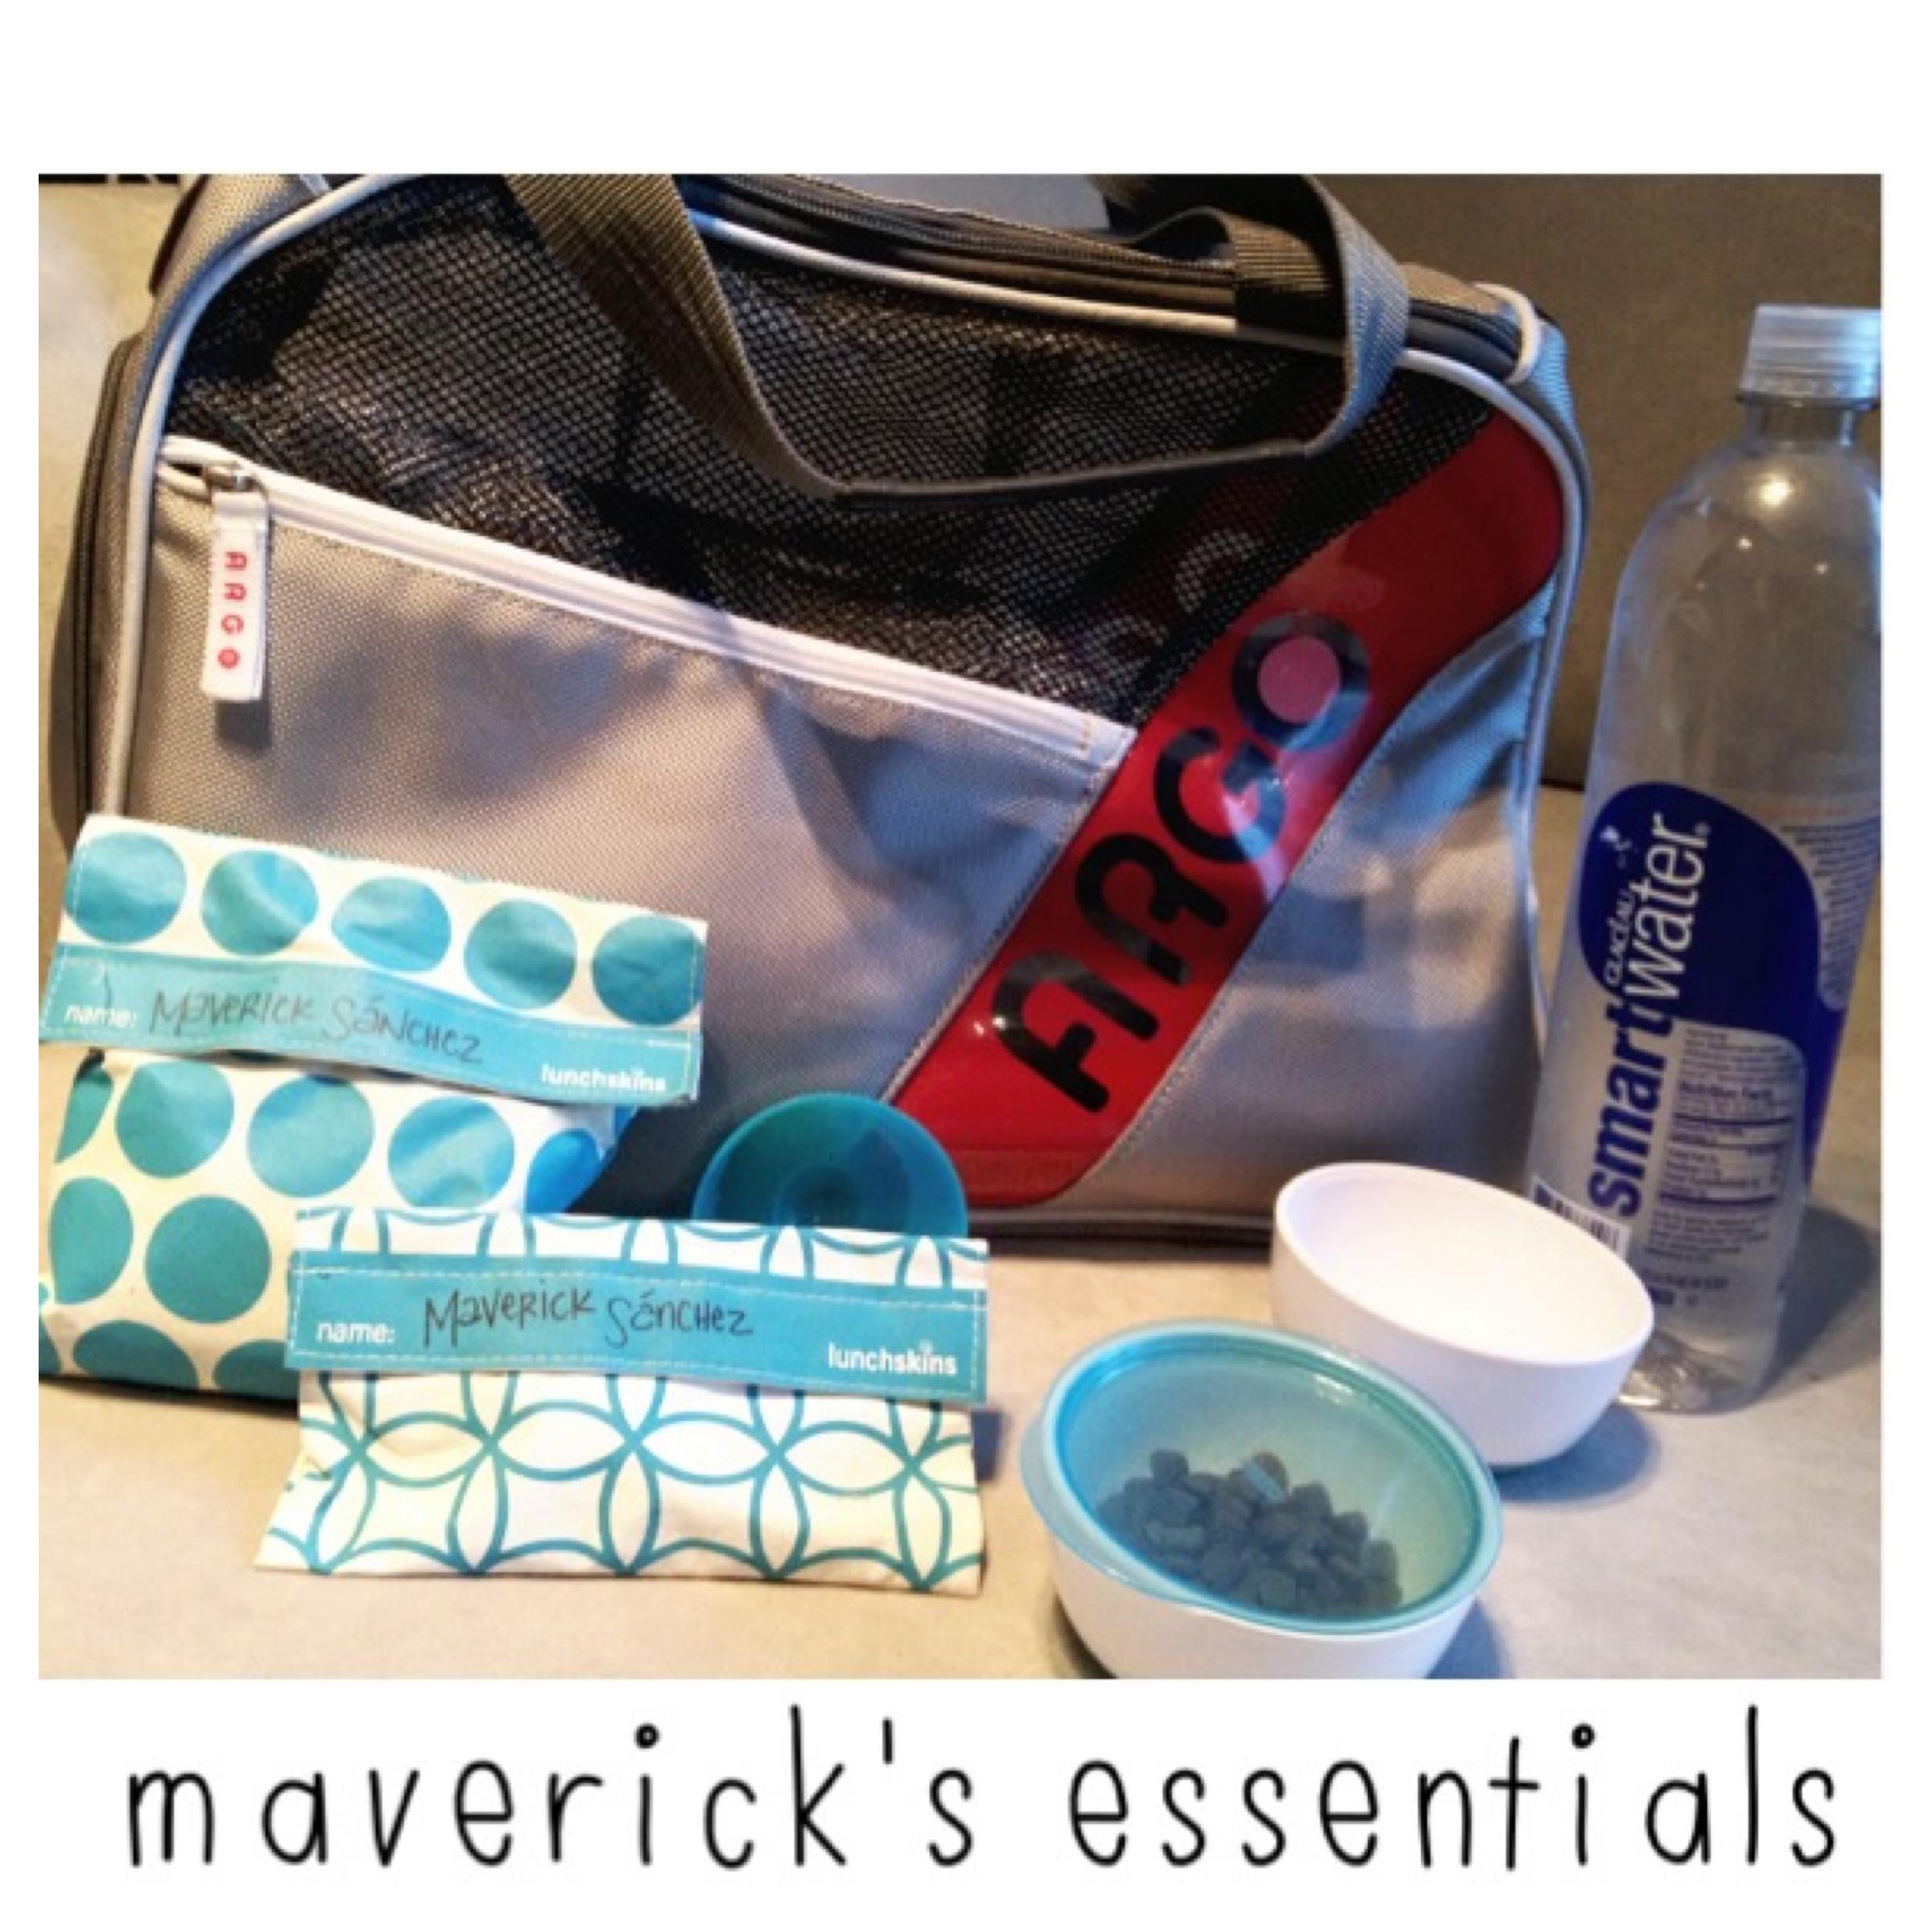 Maverick's Essentials